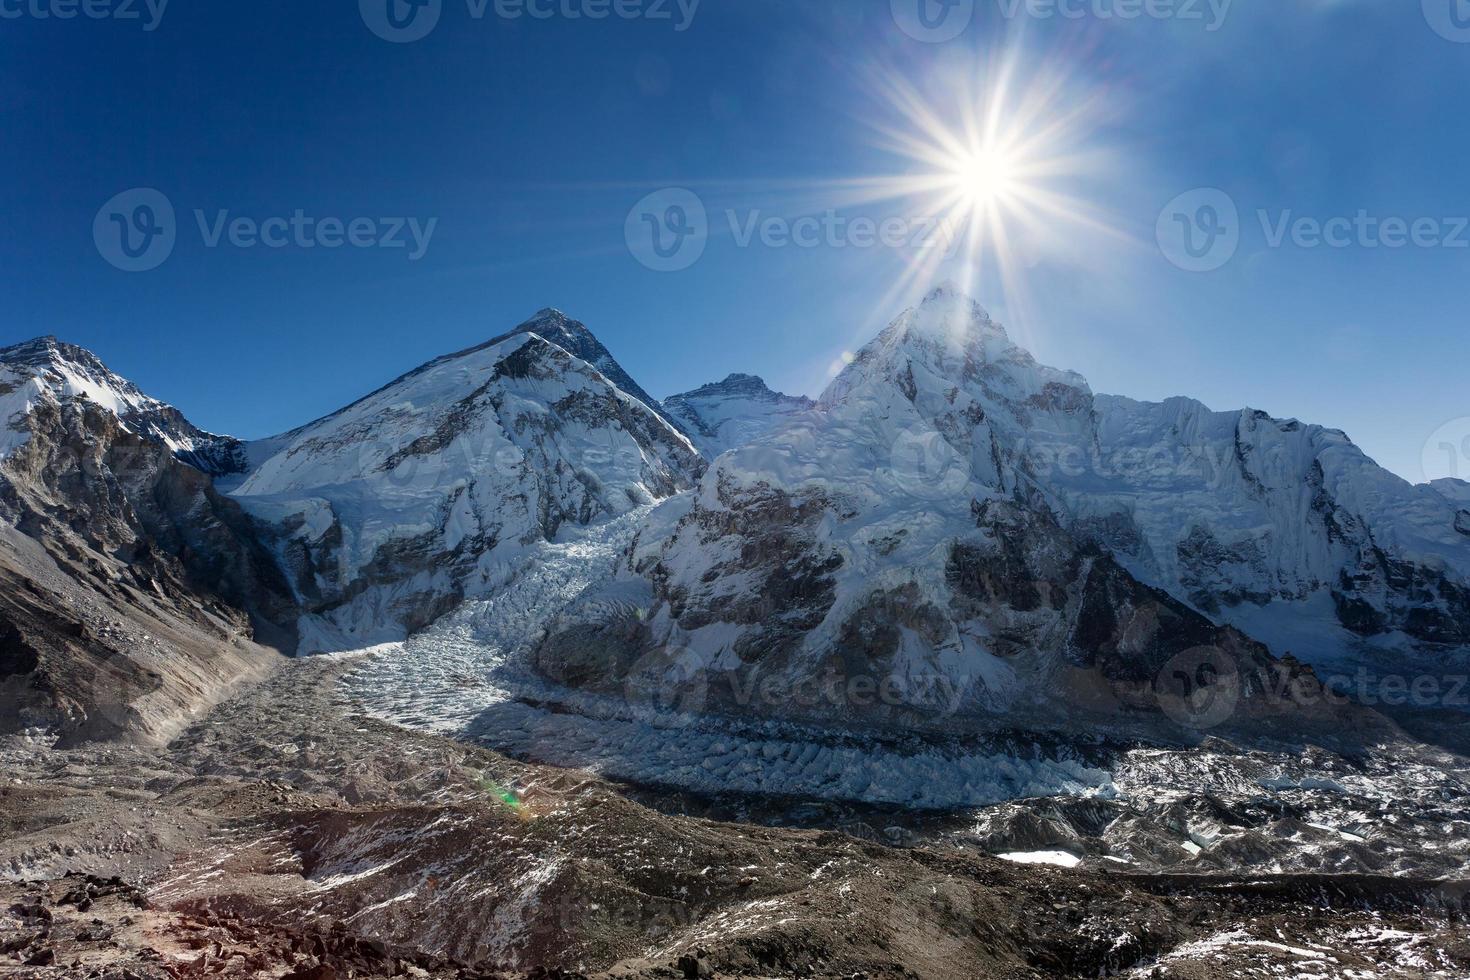 Morgensonne über dem Mount Everest, lhotse und nuptse foto